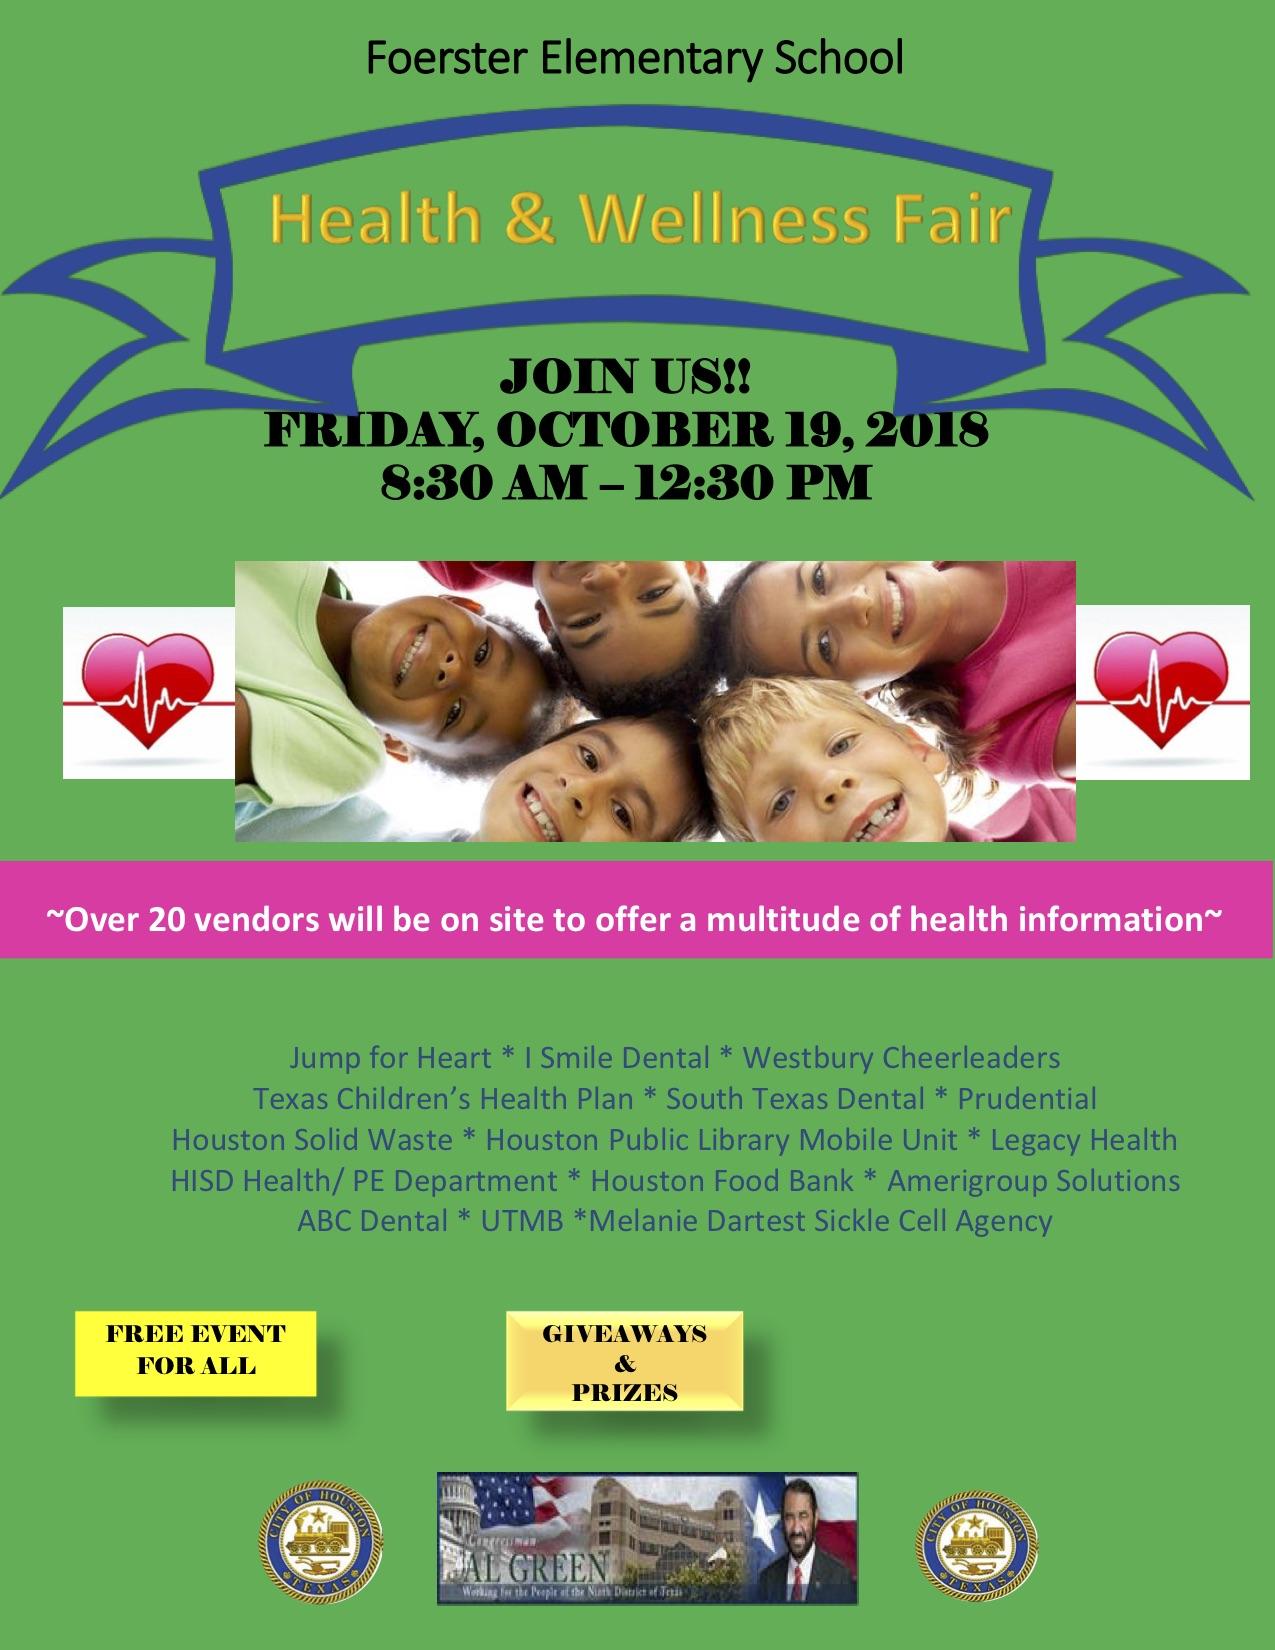 Forester Elementary School Health & Wellness Fair